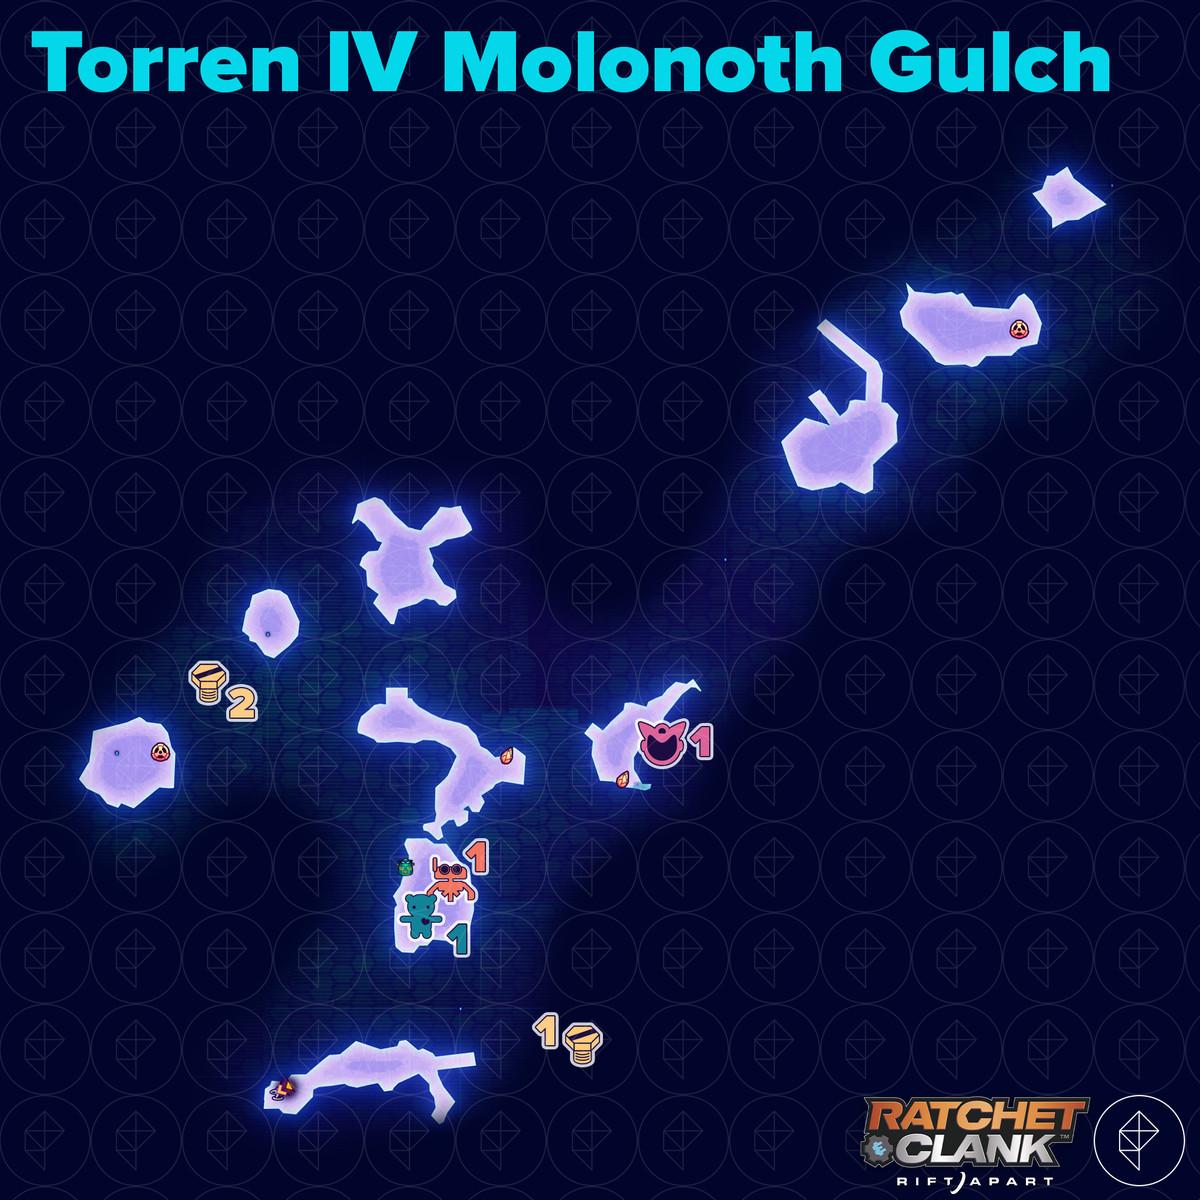 Ratchet & Clank: Rift Apart collectibles guide: Torren IV Molonoth Gulch